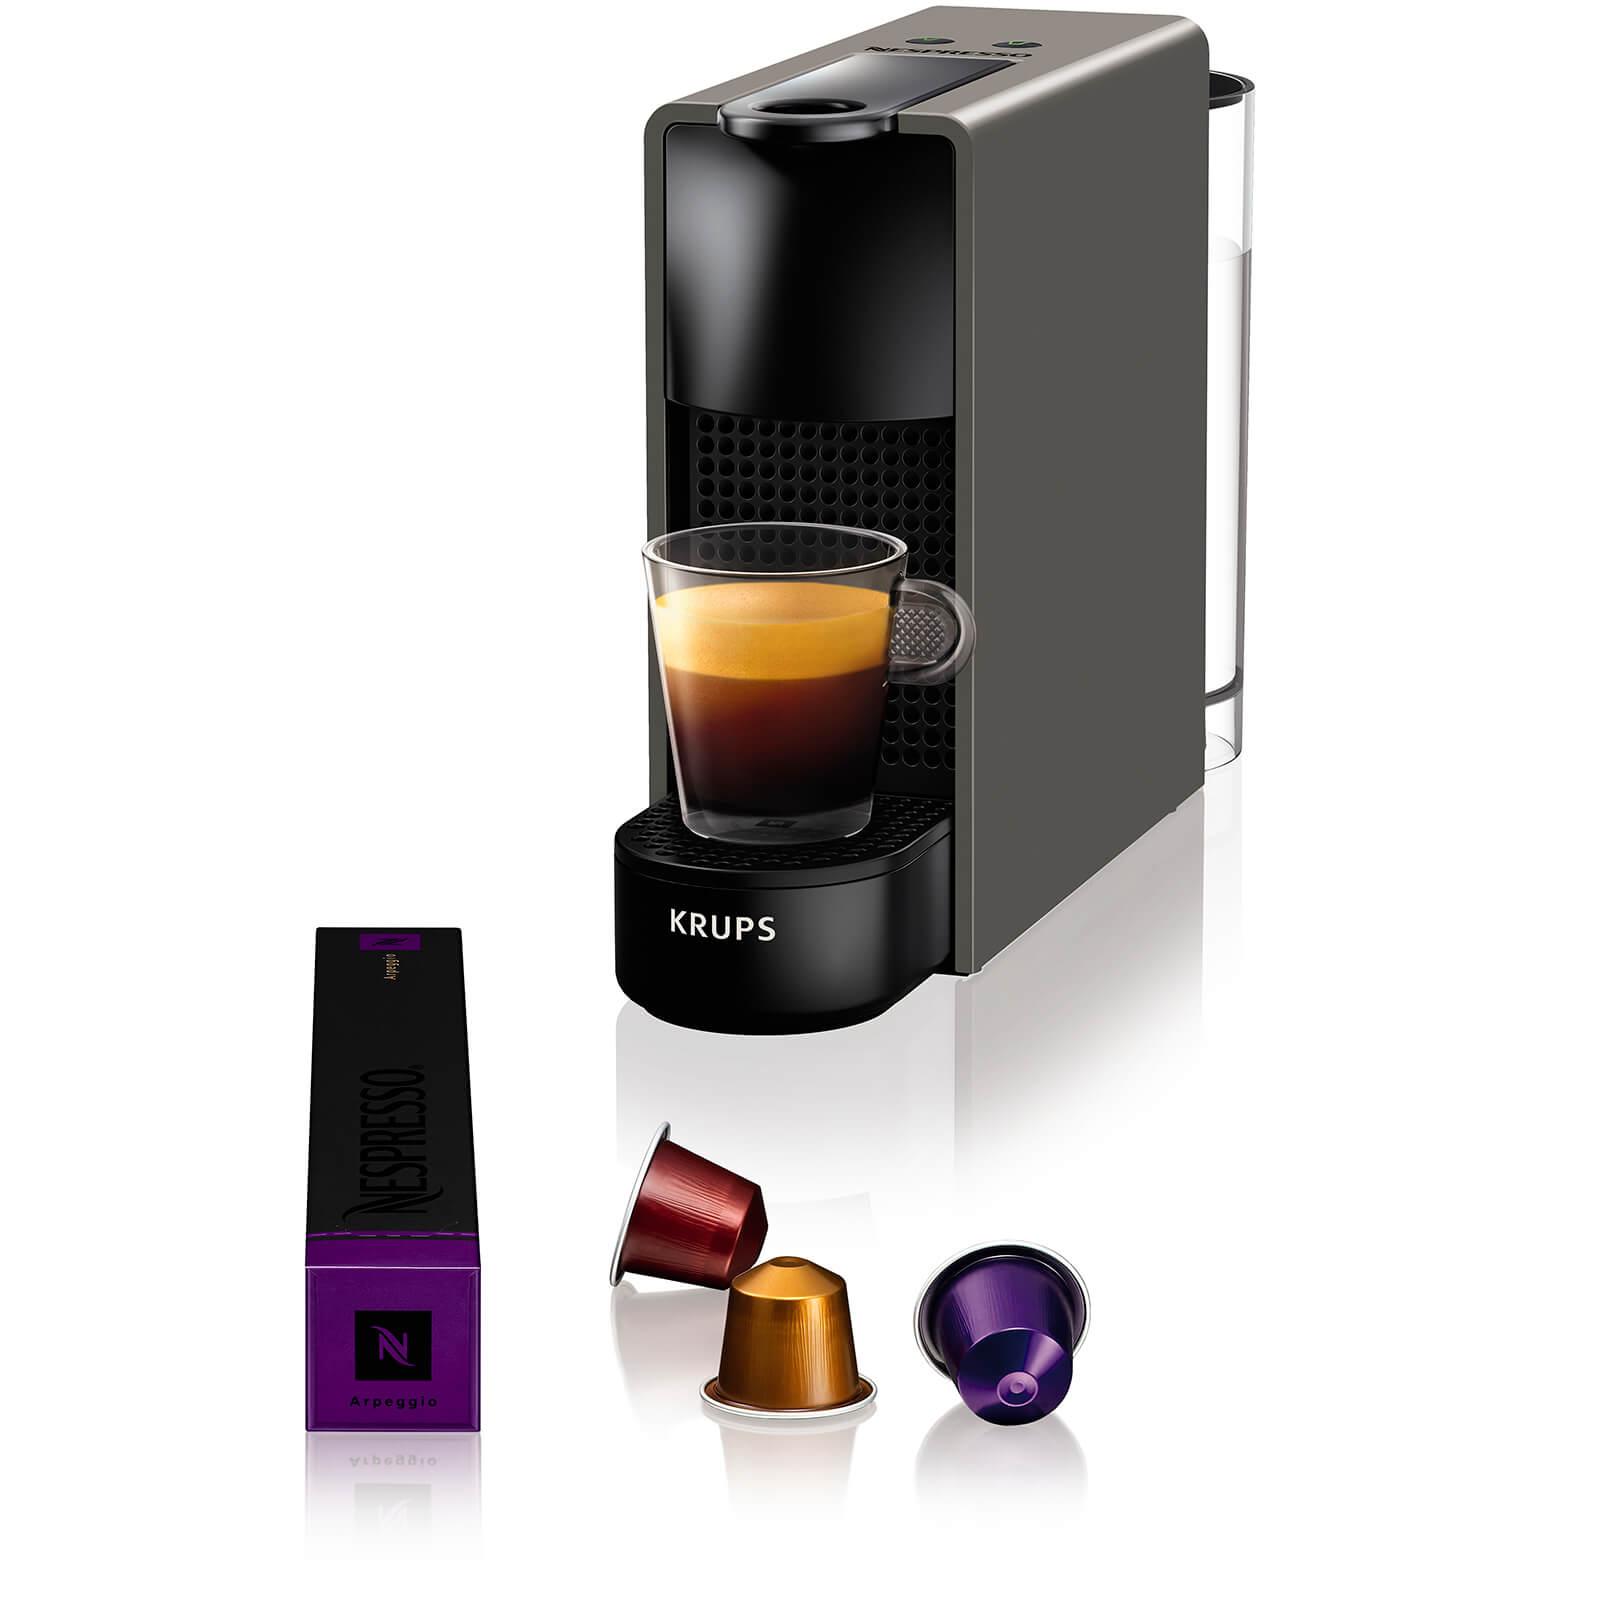 nespresso by krups xn110b40 essenza mini coffee machine. Black Bedroom Furniture Sets. Home Design Ideas